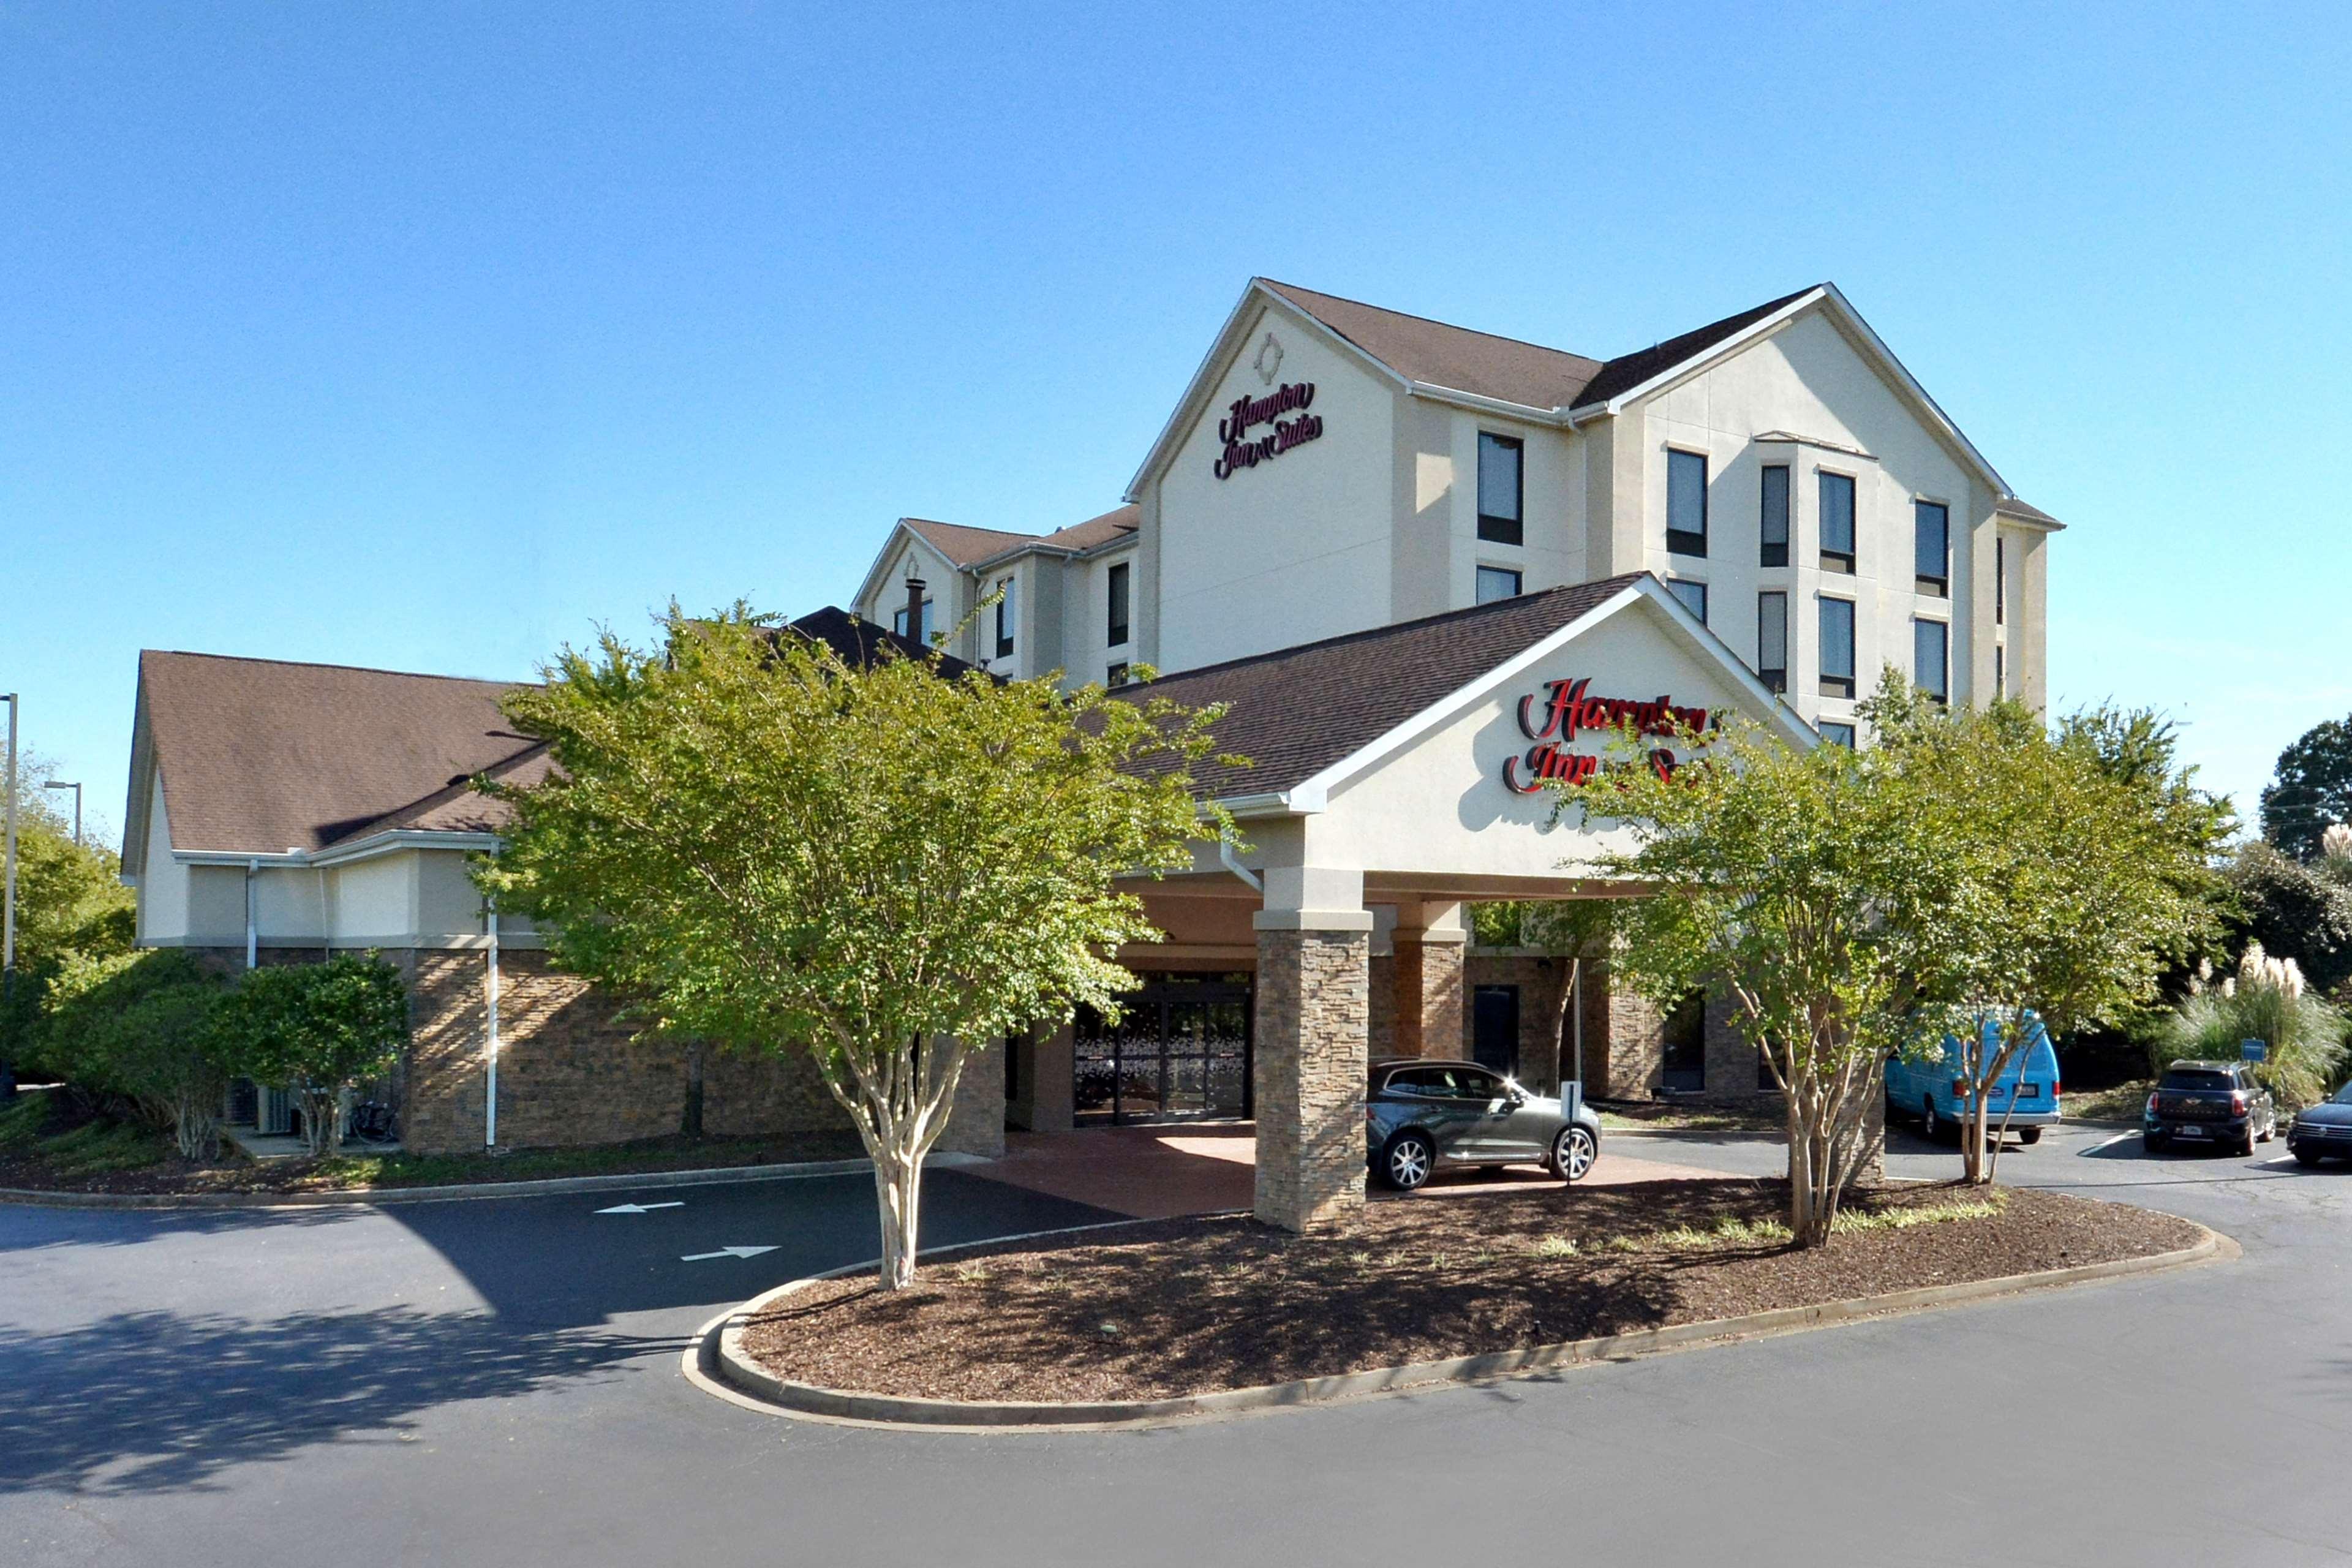 Hampton Inn & Suites Greenville/Spartanburg I-85 image 5